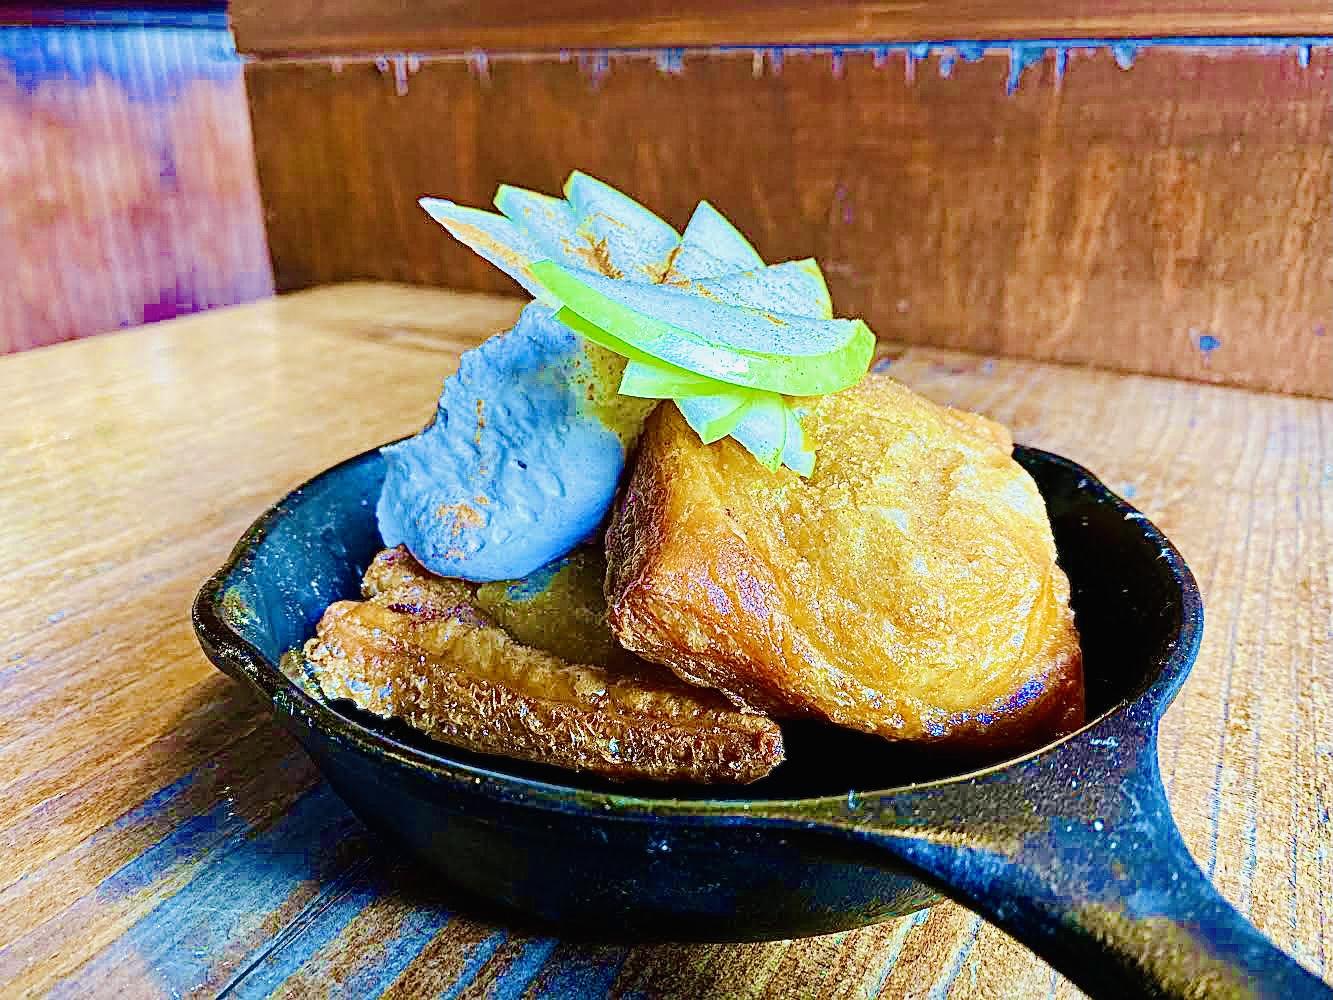 The Monk's Kettle Apple Hand Pie